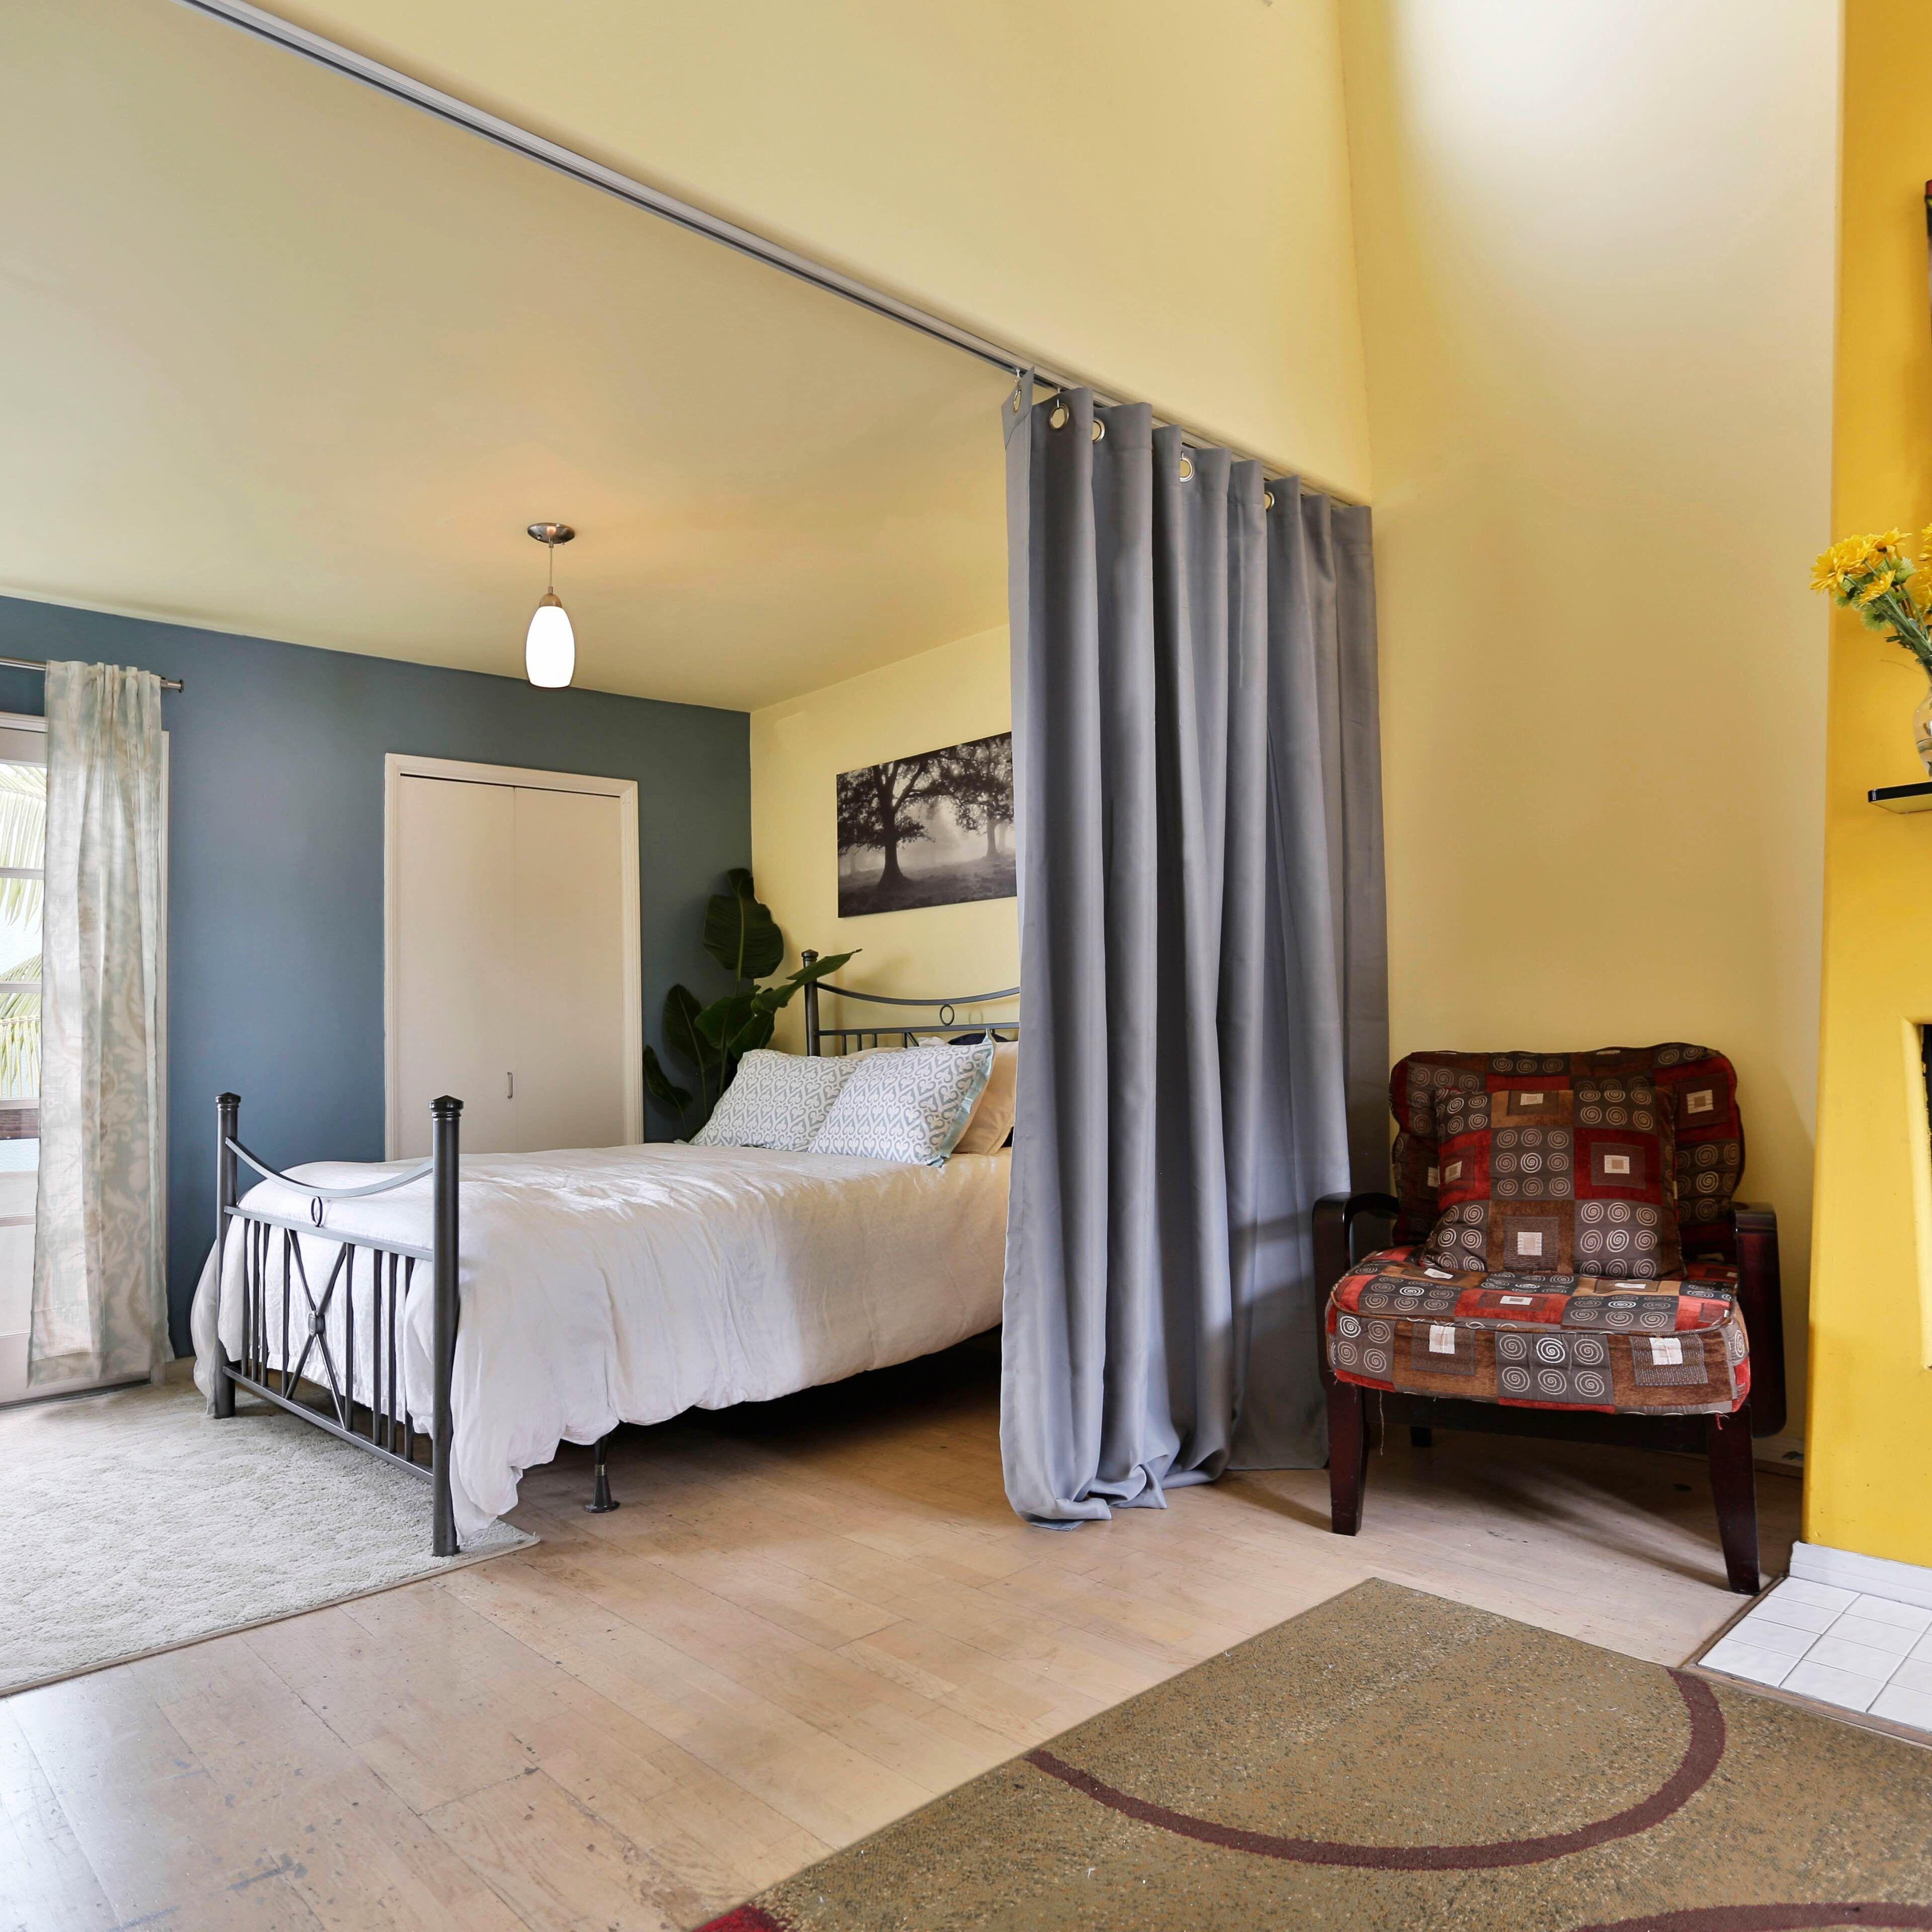 Ceiling Track Room Divider Kits Studio Apartmentapartment